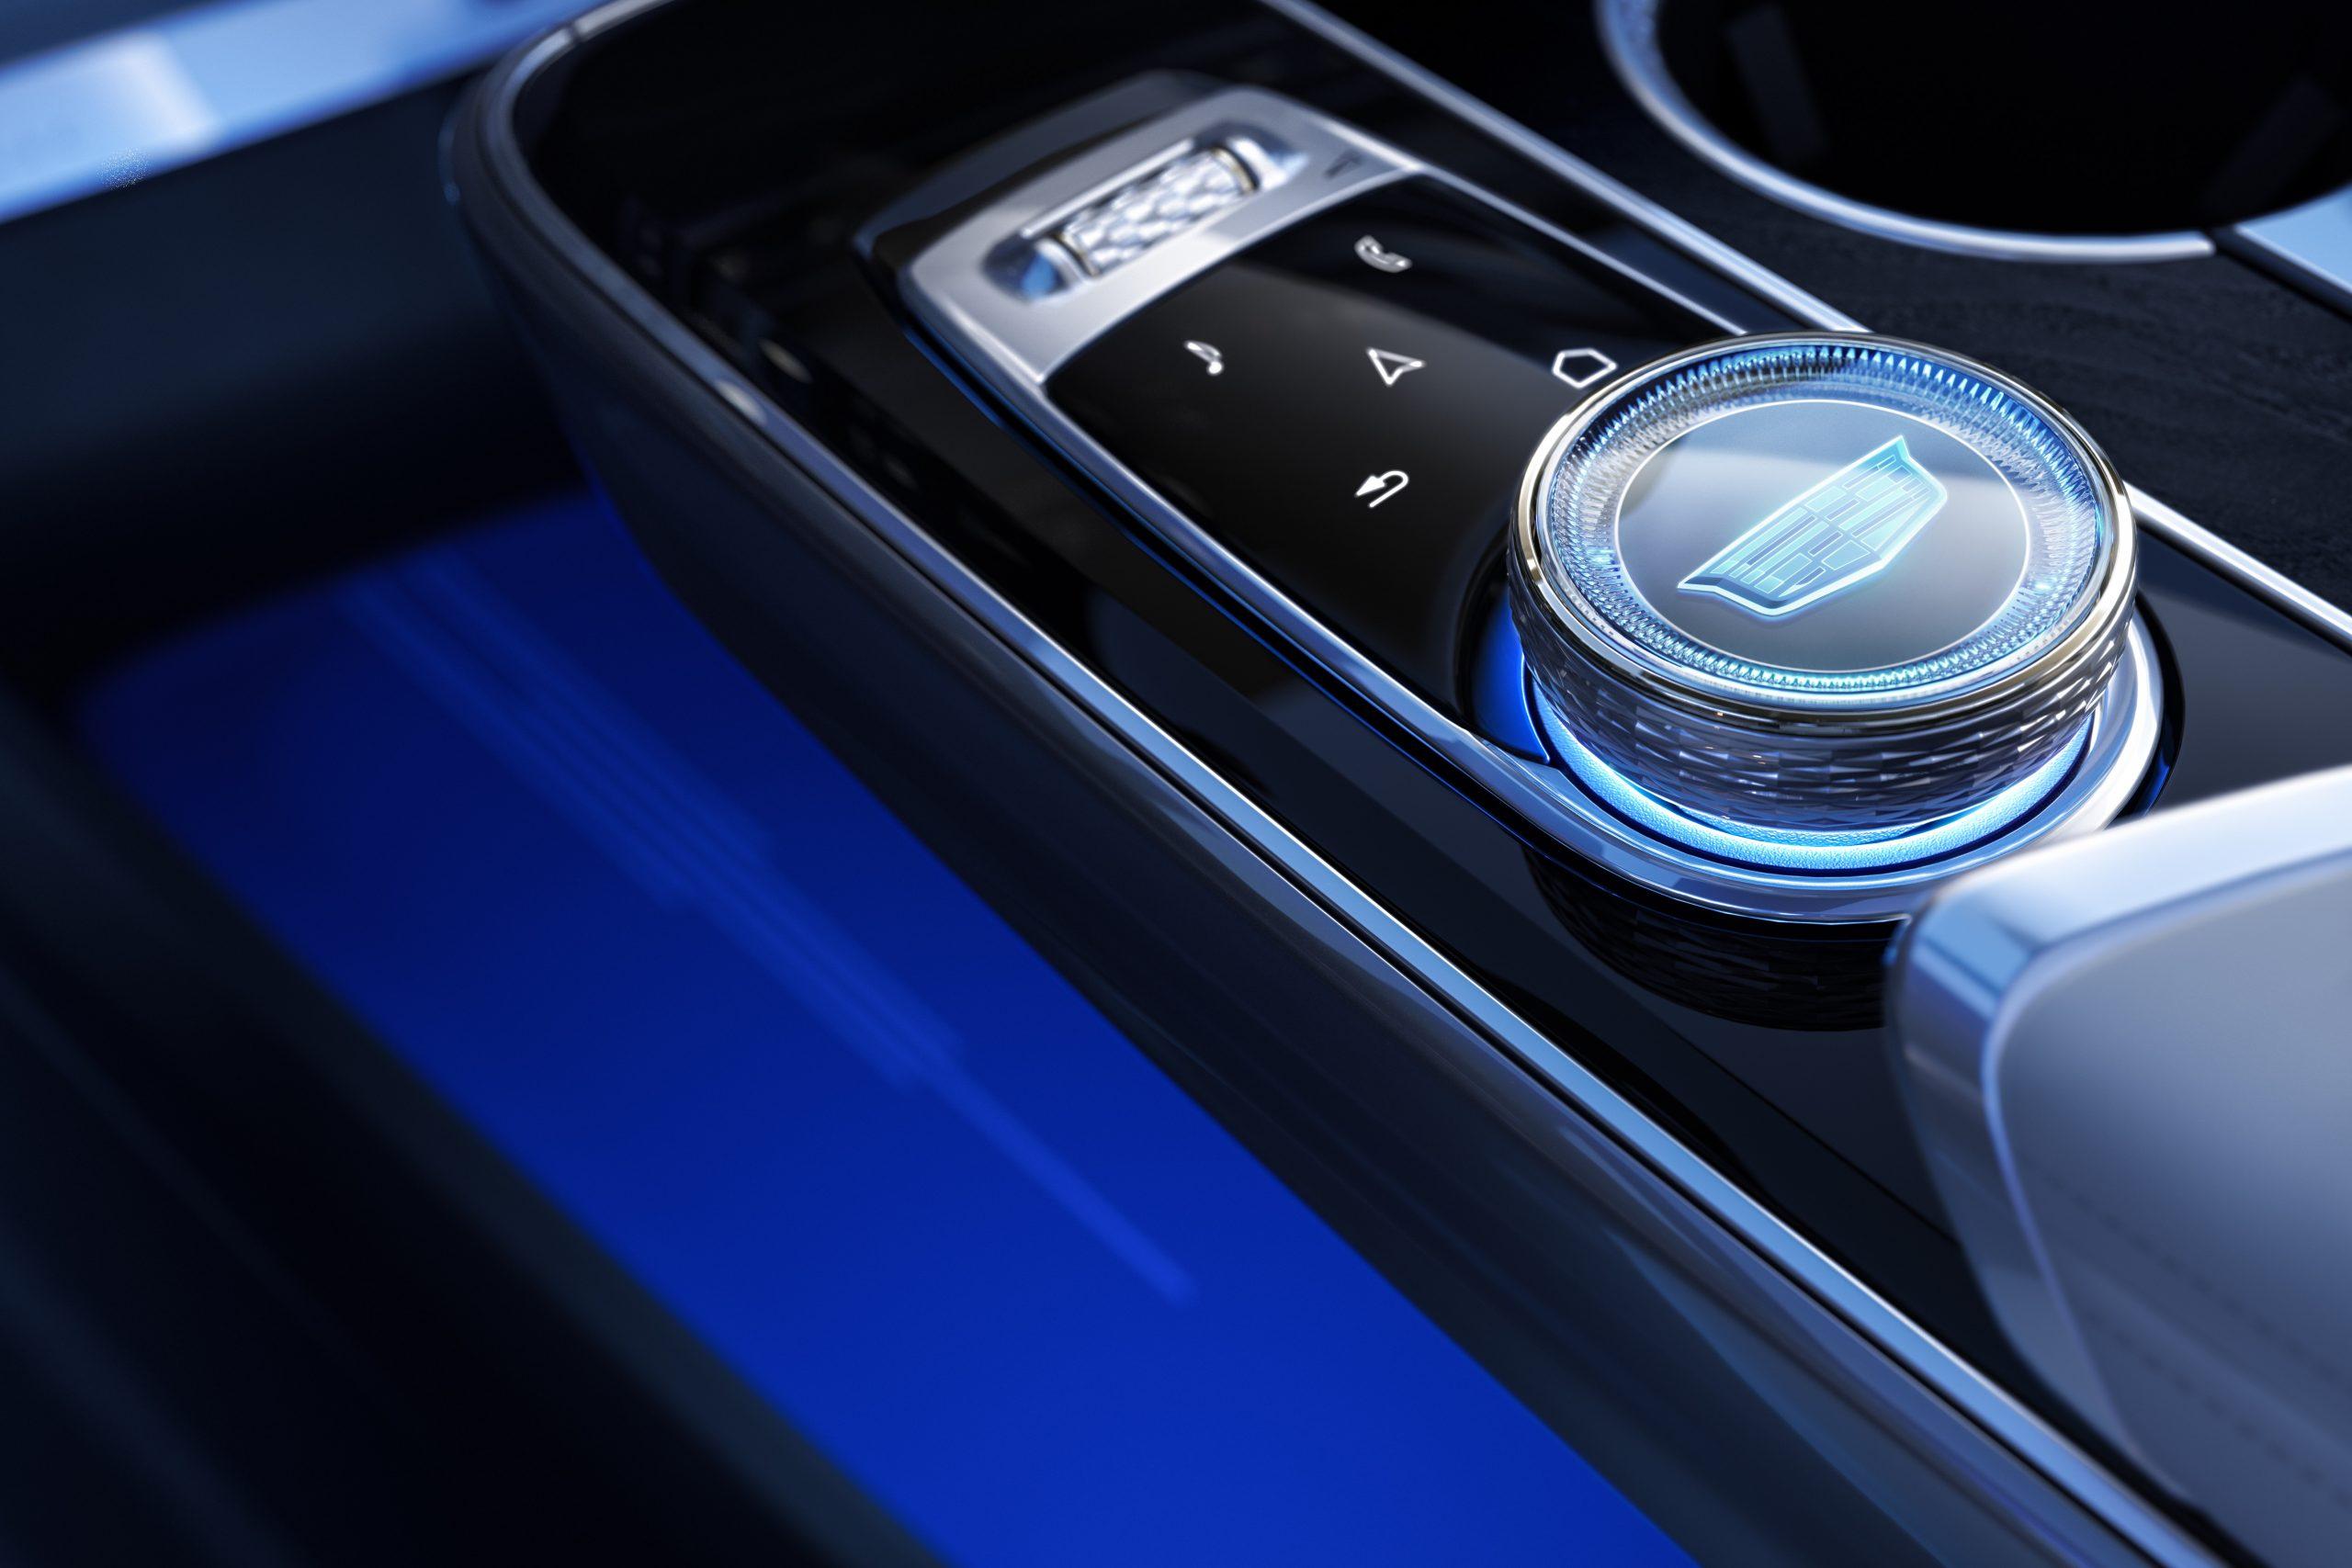 2023 Cadillac Lyriq interior console controller lit up